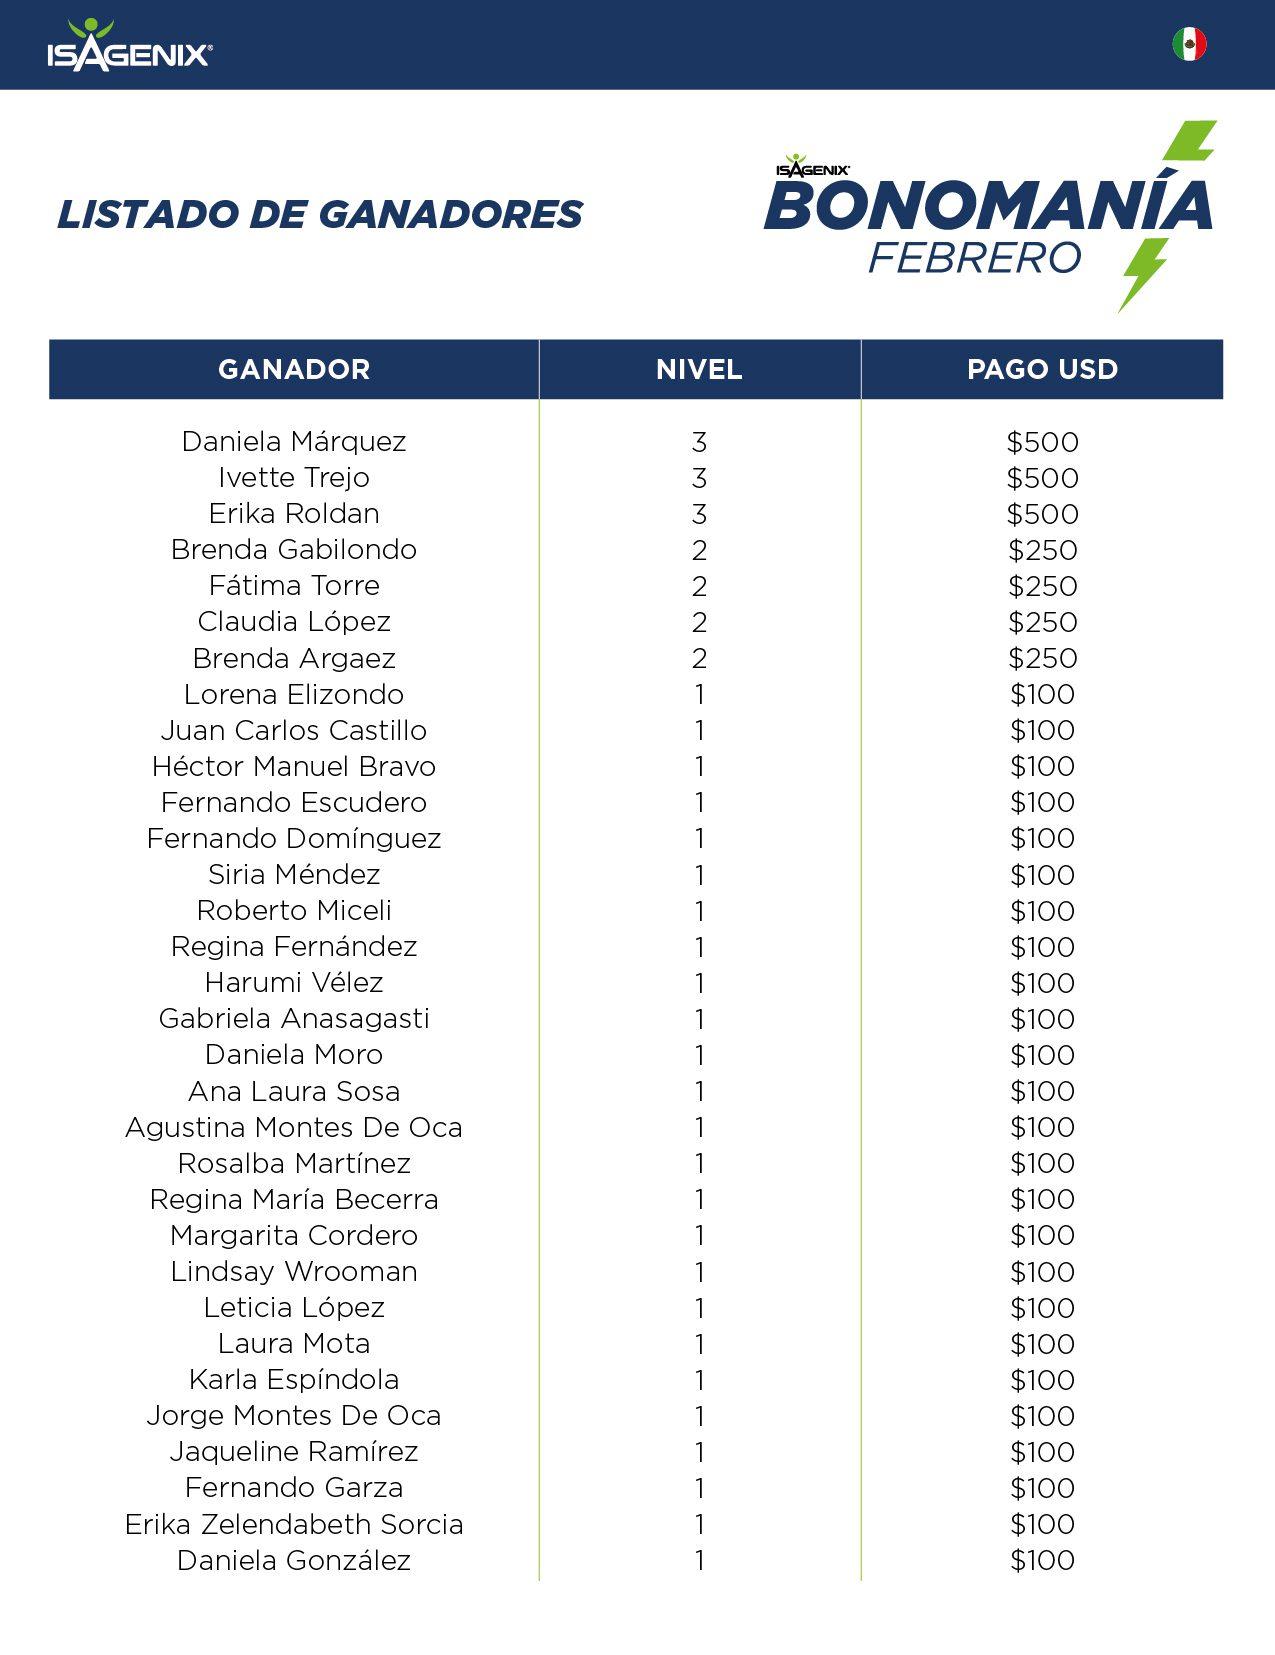 lista-ganadores_bonomania_febrero_2-01